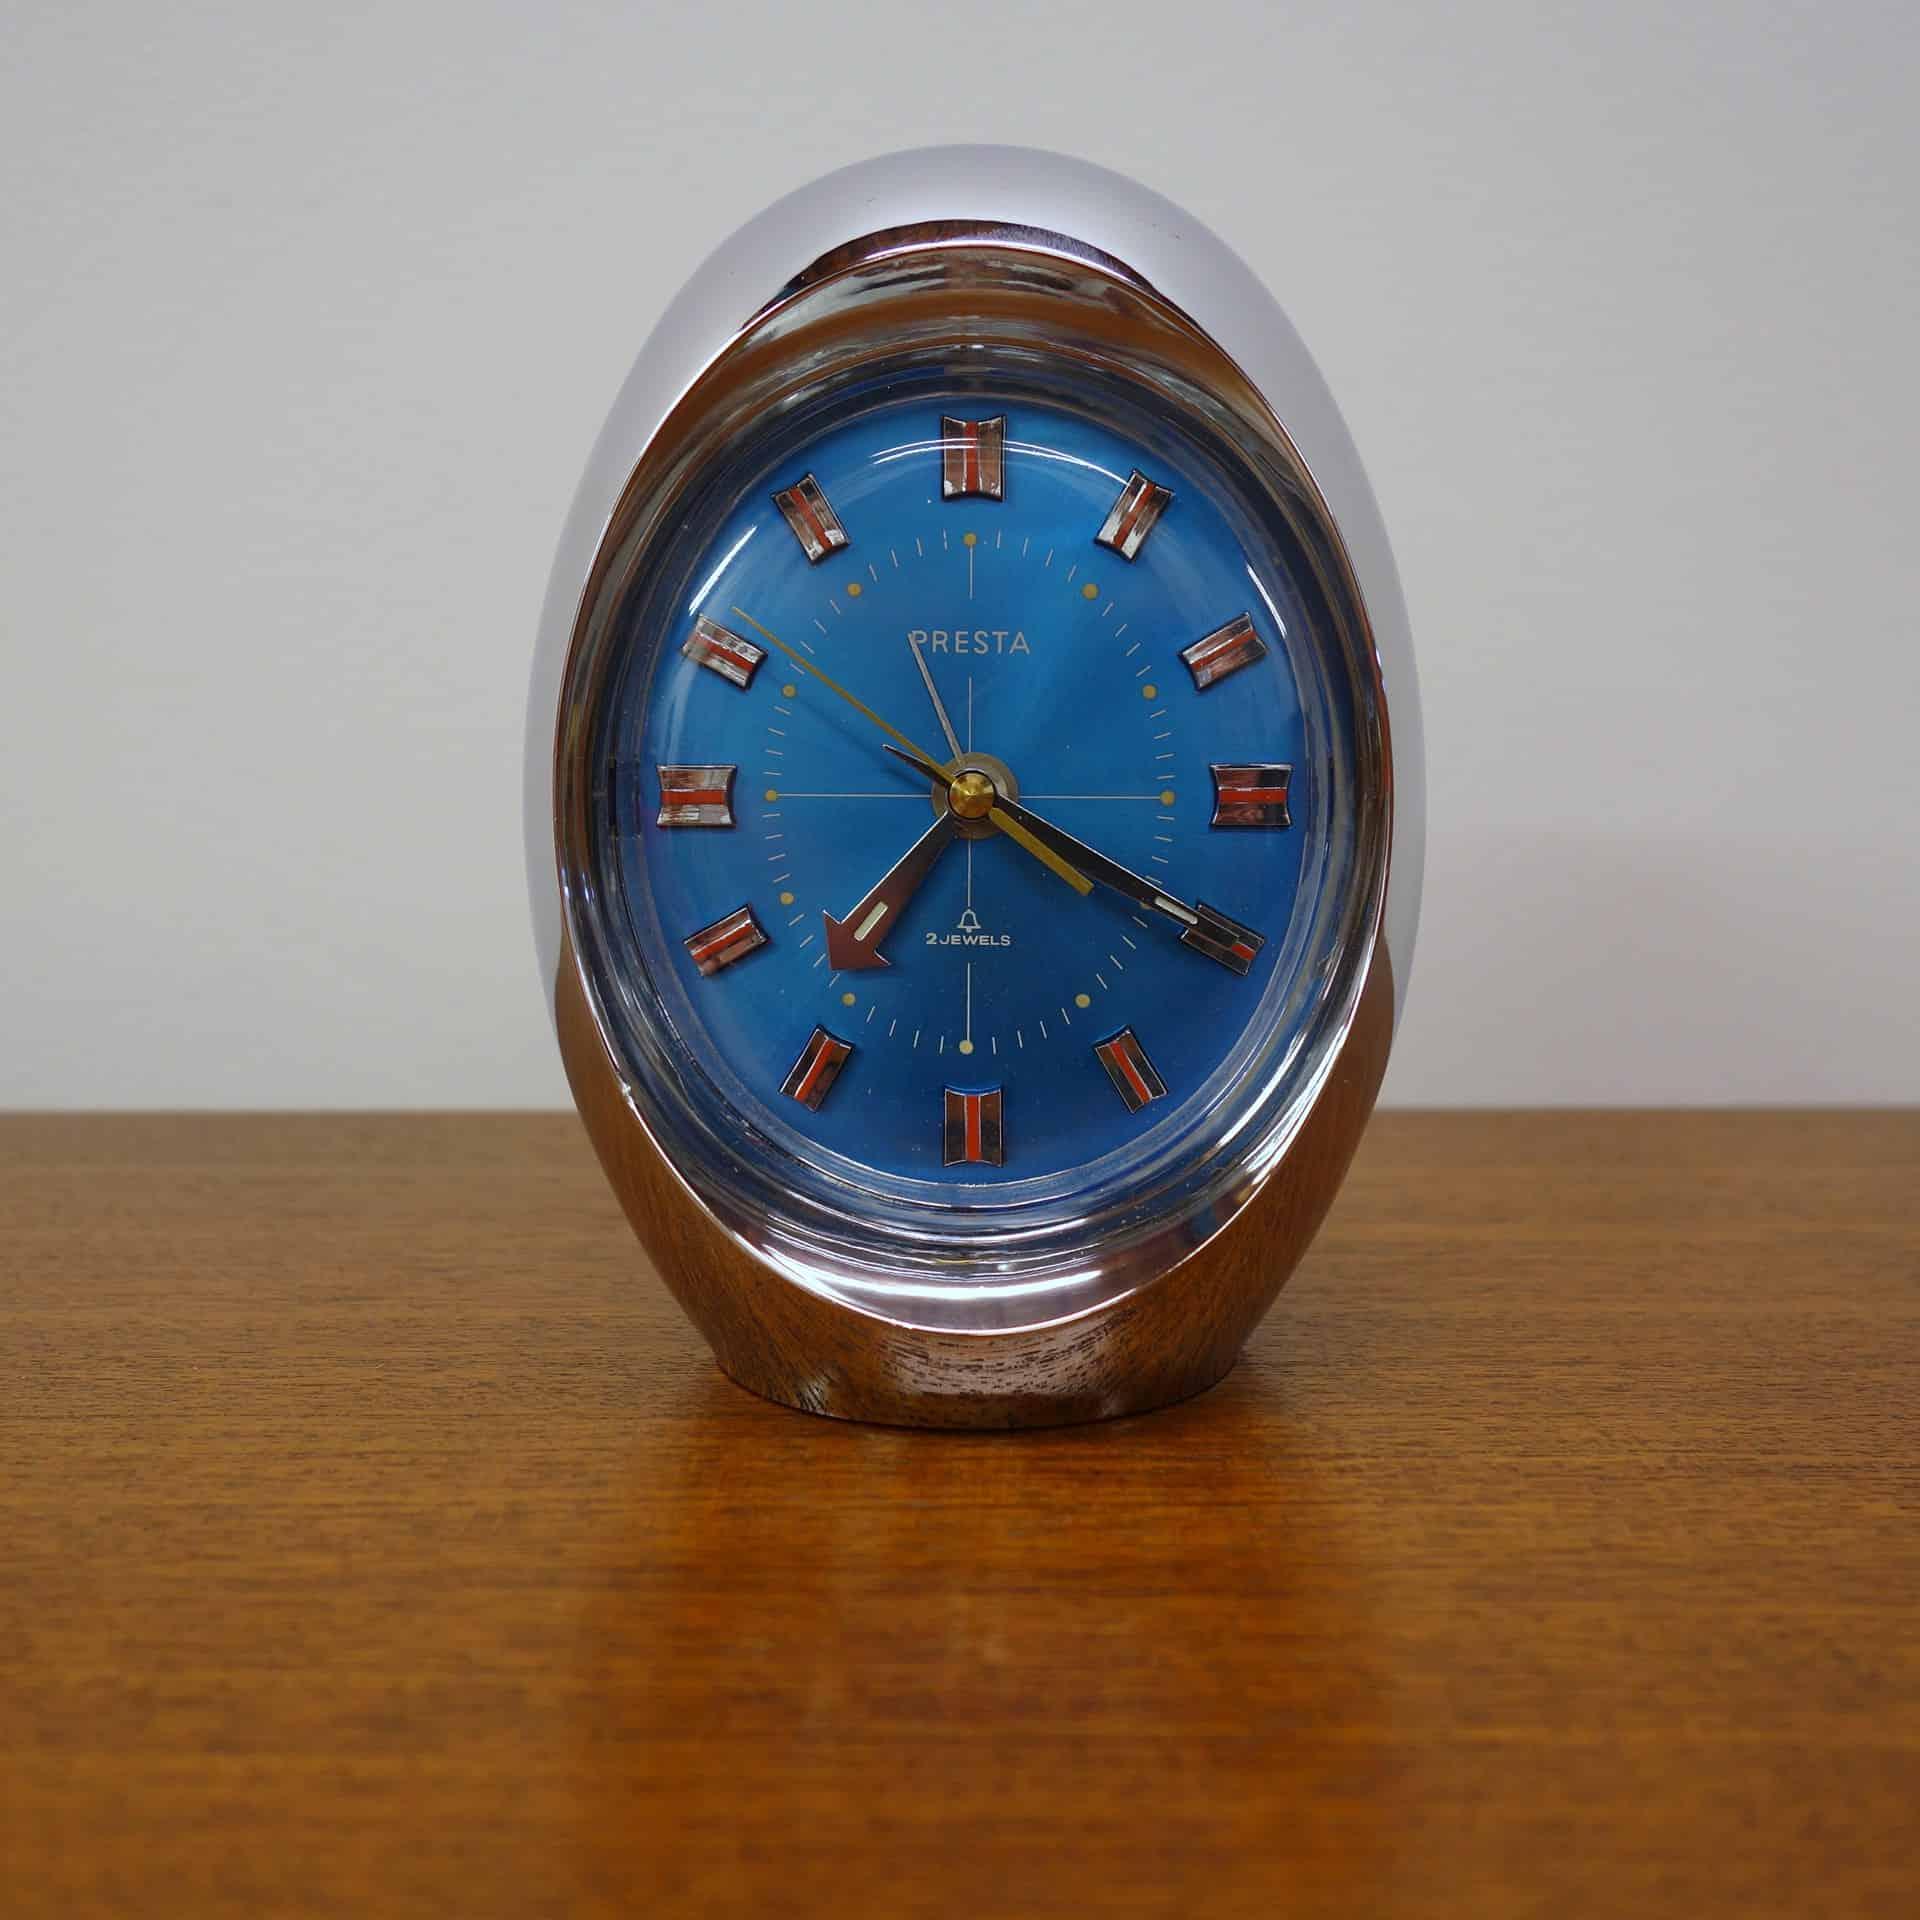 1970s chrome alarm clock made by Presta